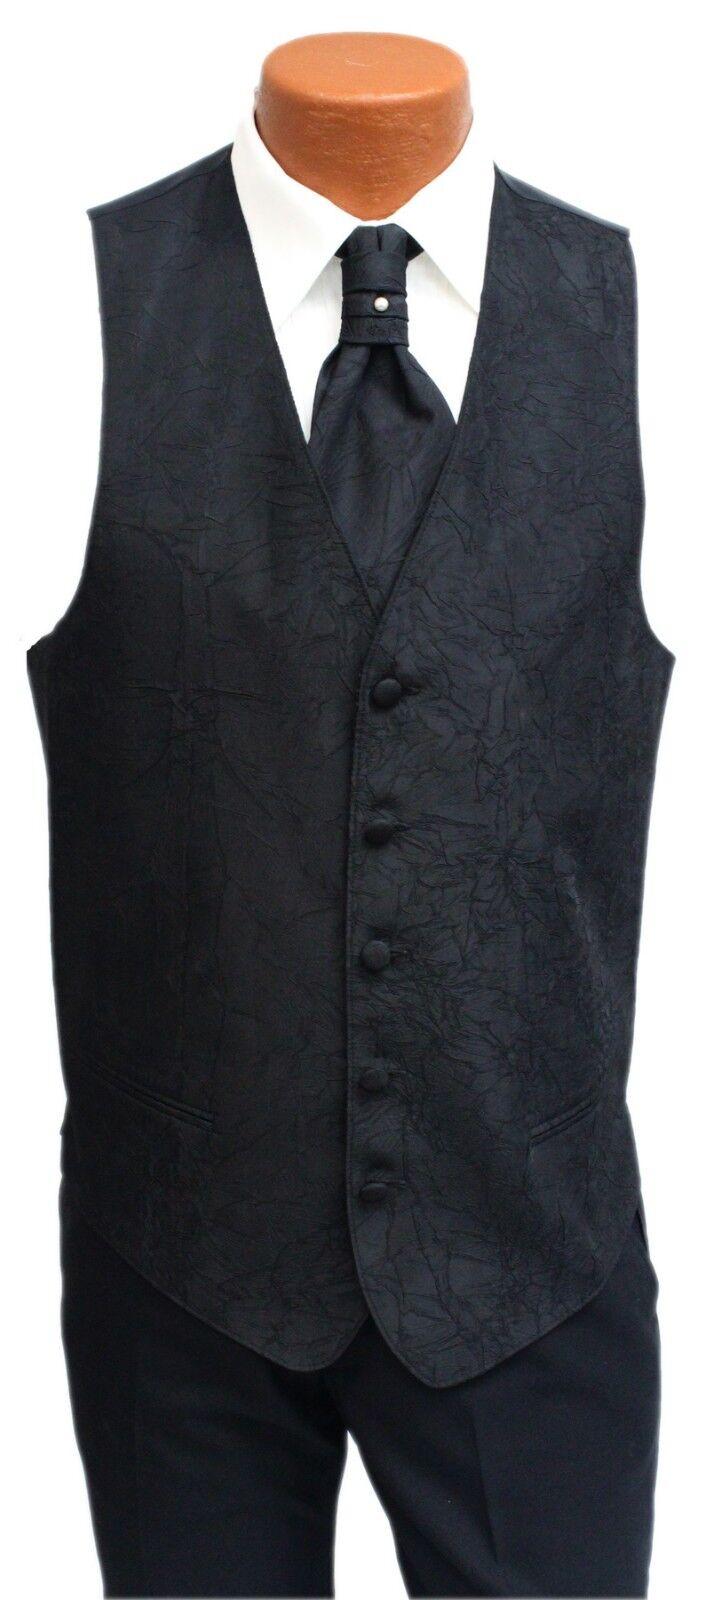 Black Mens Matisse Fullback Formal Tuxedo Vest & Tie Wedding w/ Pocket Square